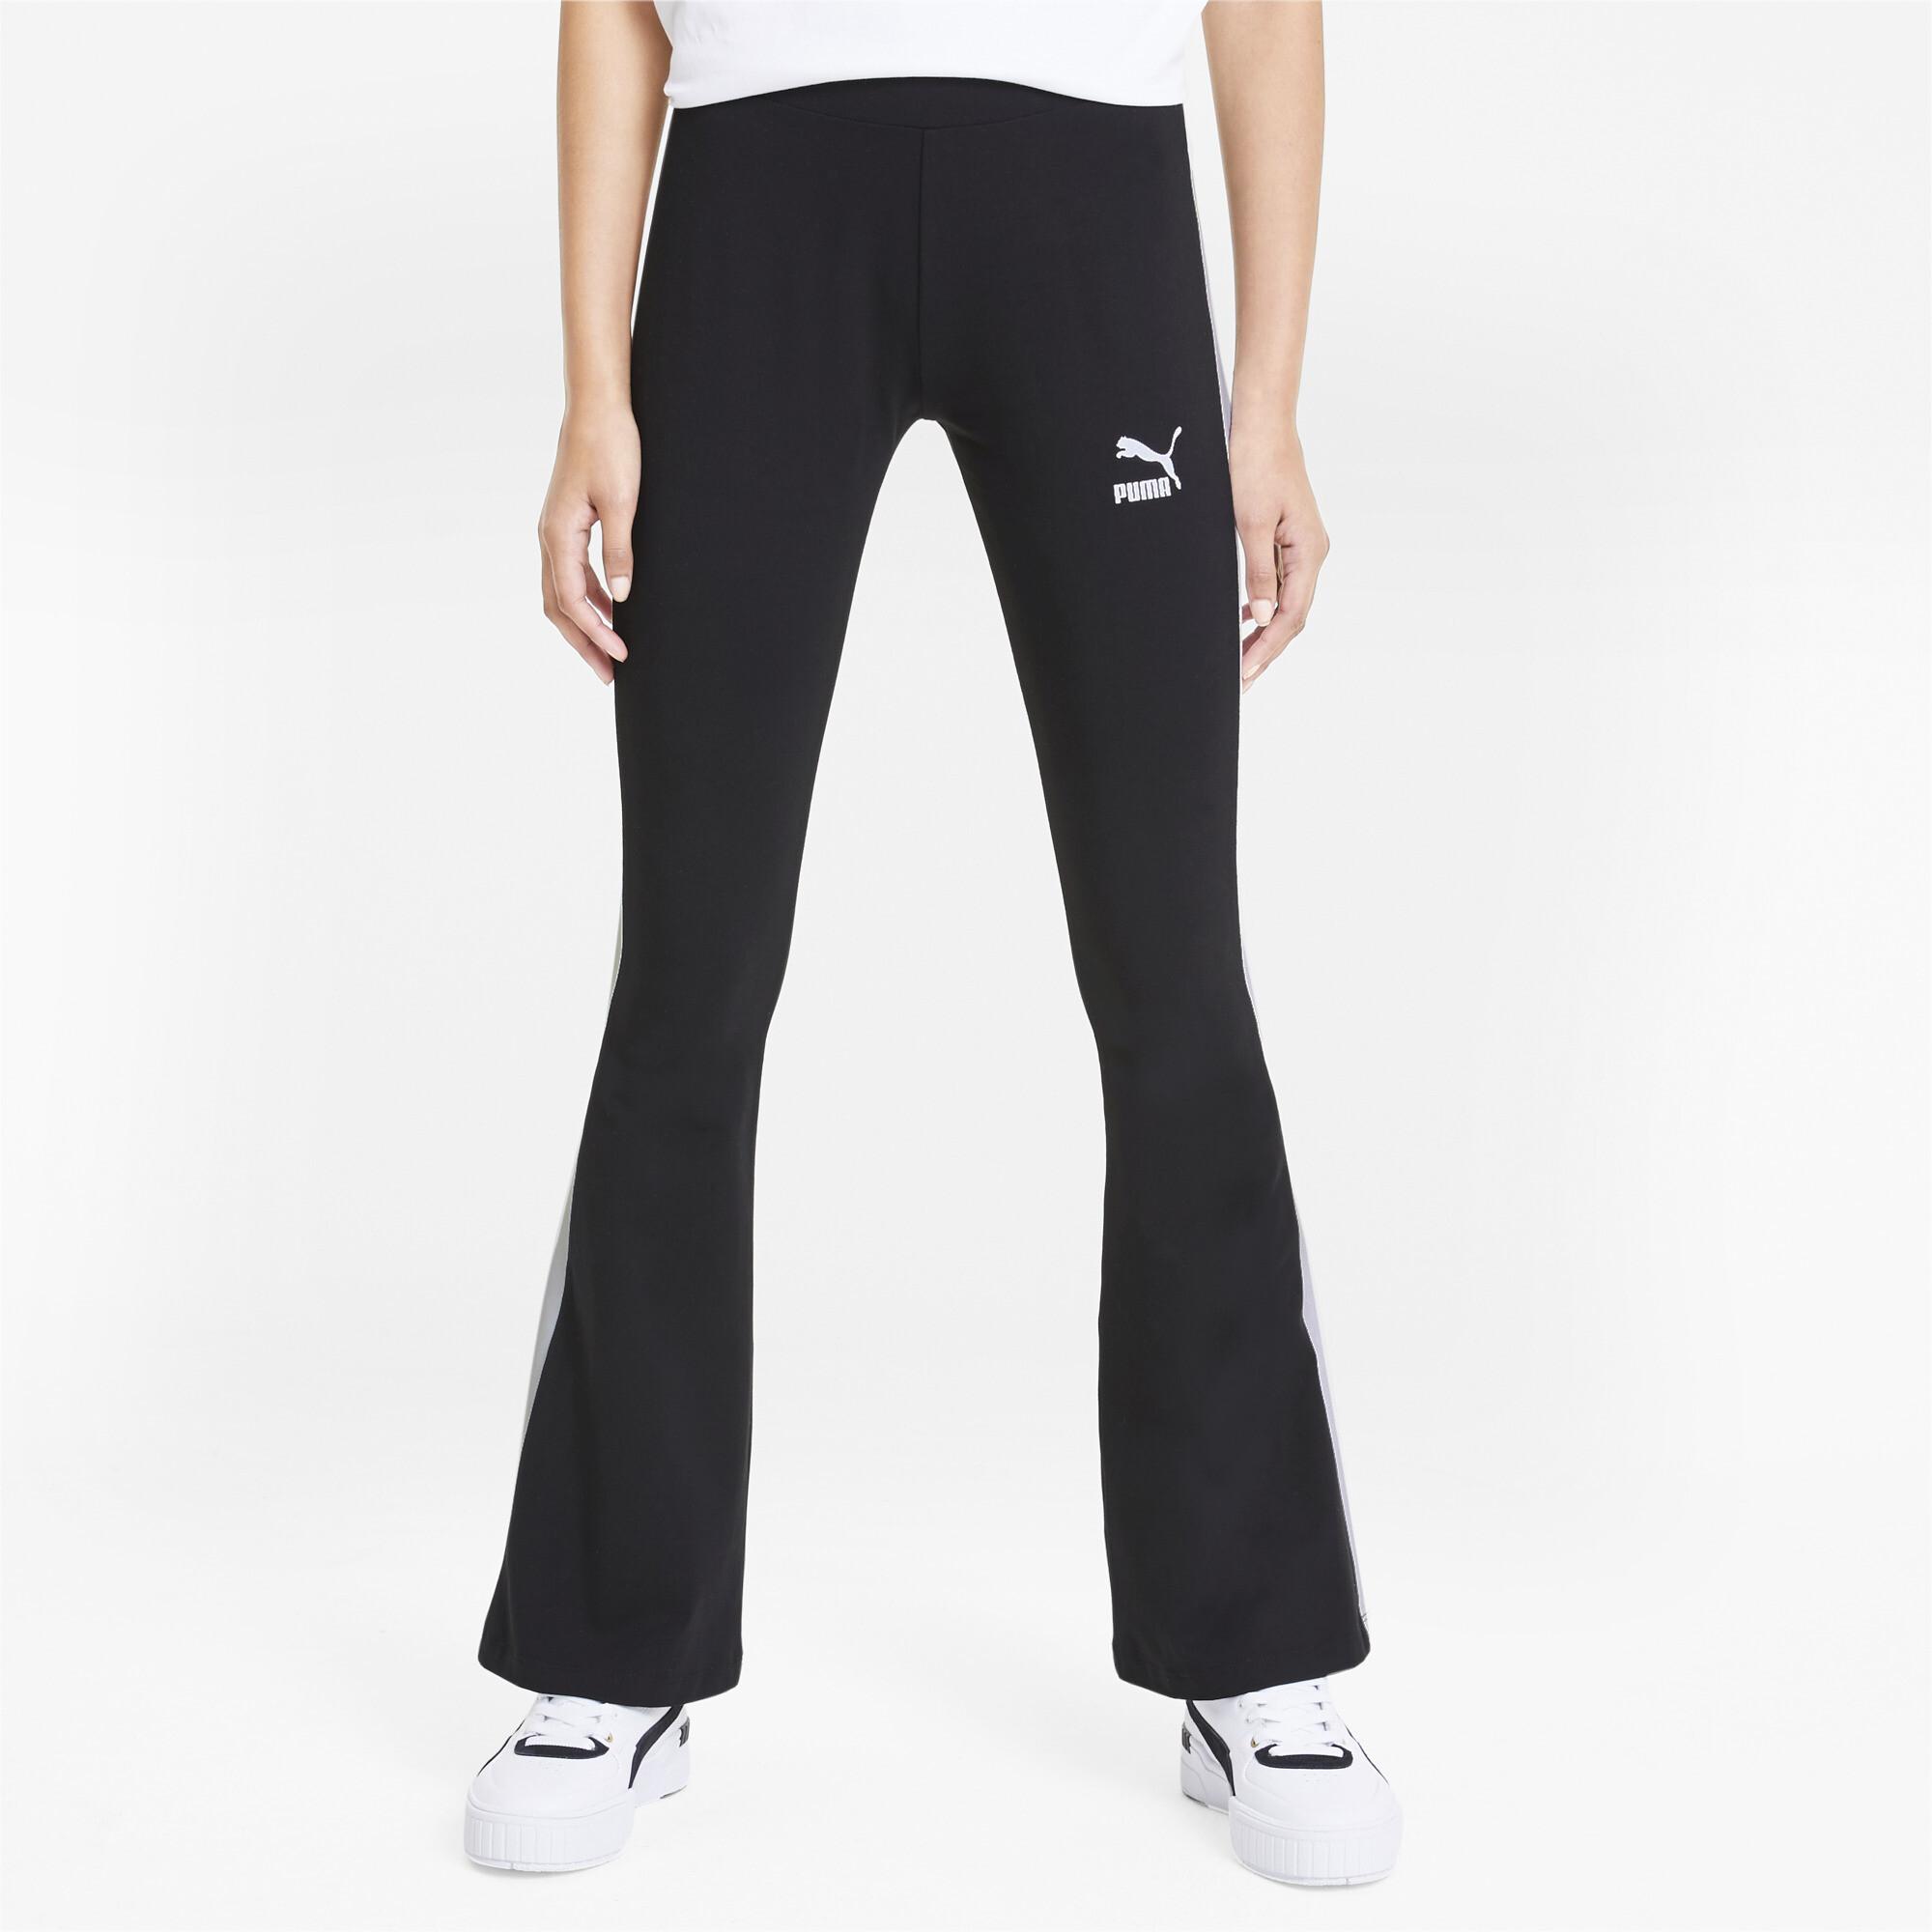 PUMA-Classics-Logo-Women-039-s-Flared-Leggings-Sport-Classics thumbnail 4